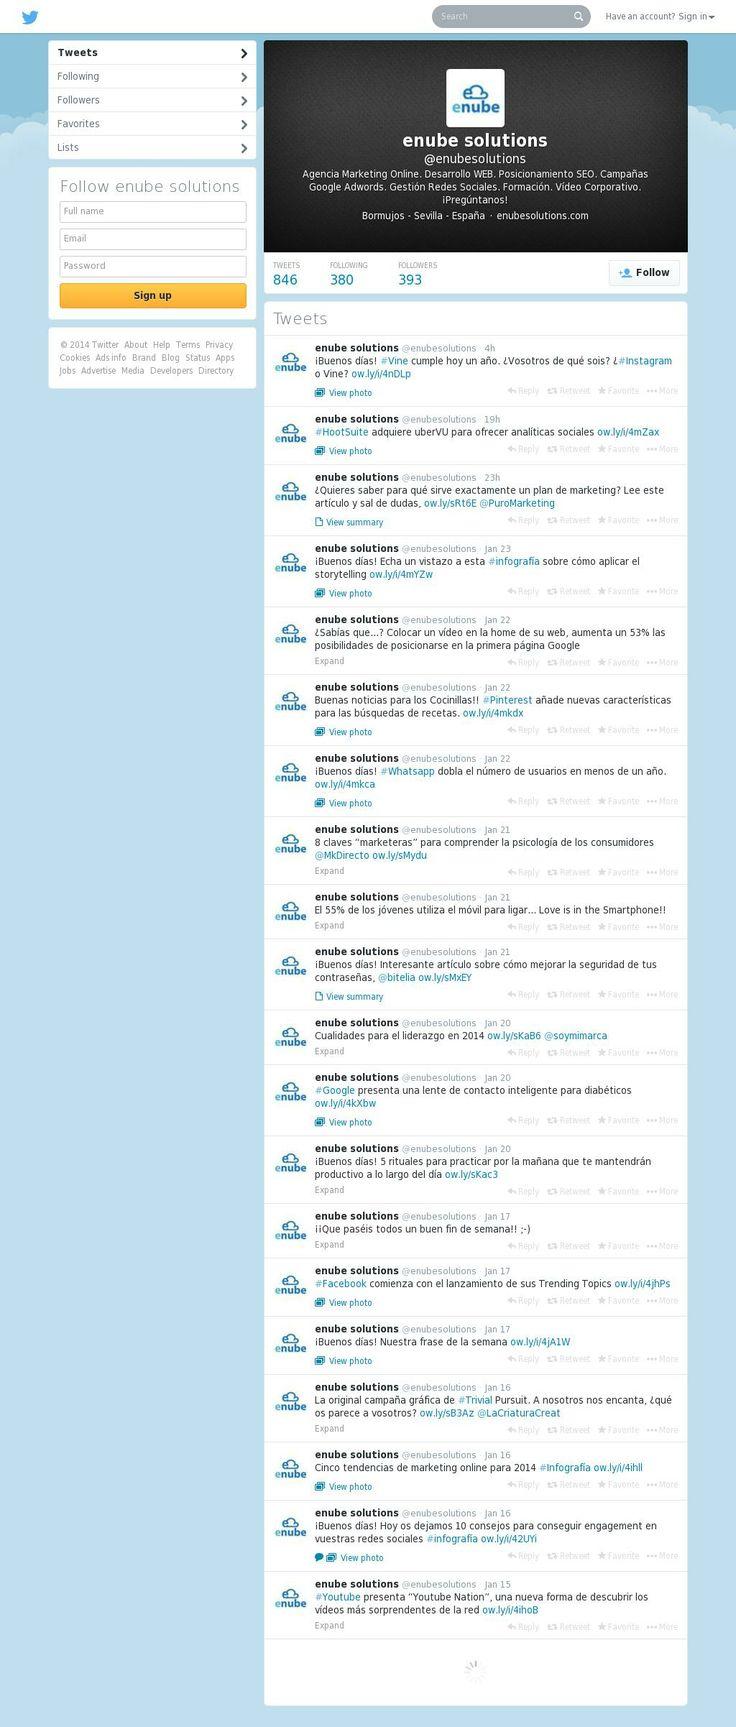 Enube Marketing Solutions ¡en Twitter! ¿nos sigues? ;-D https://twitter.com/enubesolutions